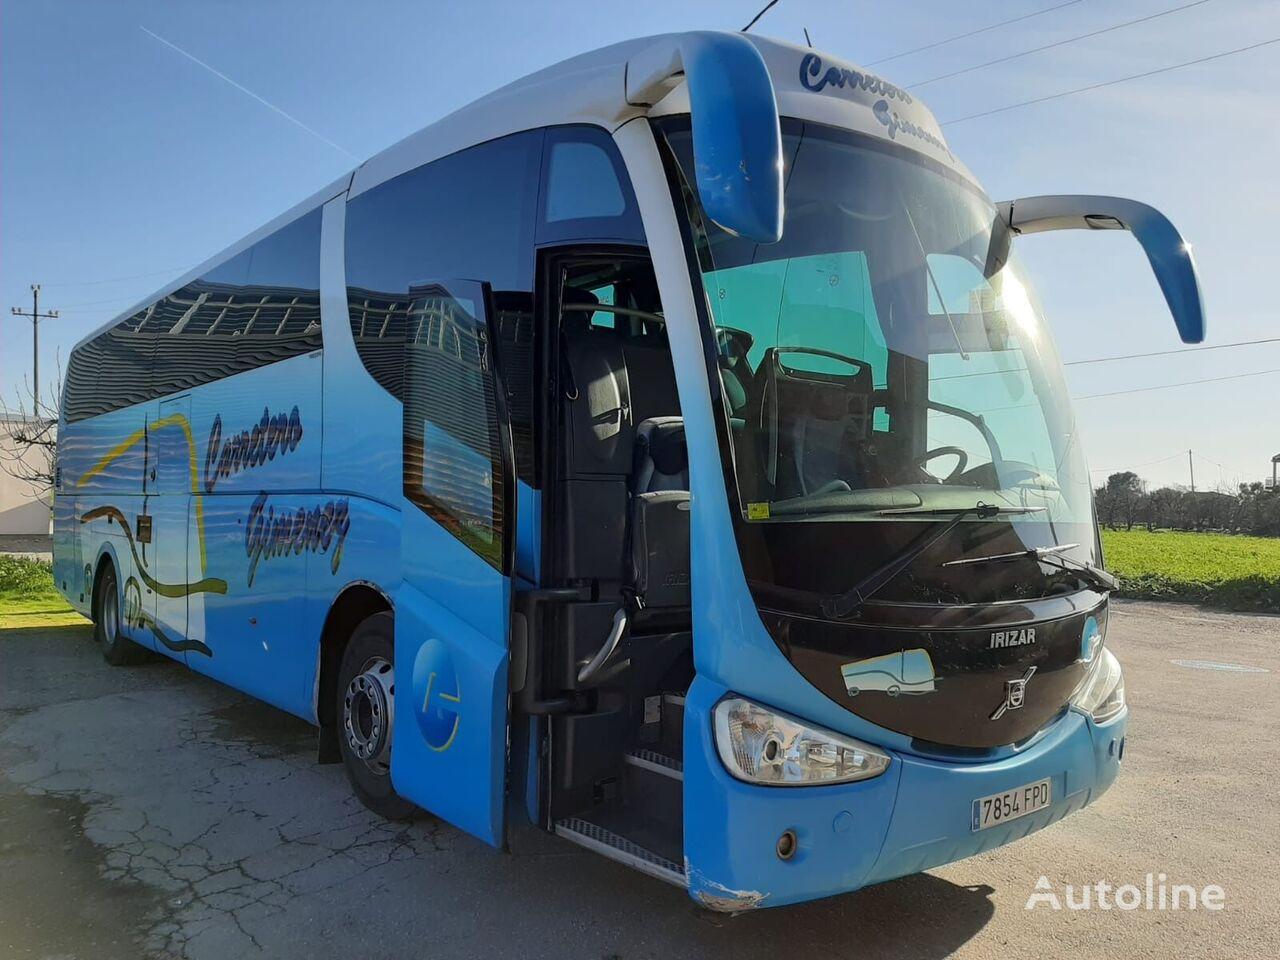 VOLVO B12B coach bus